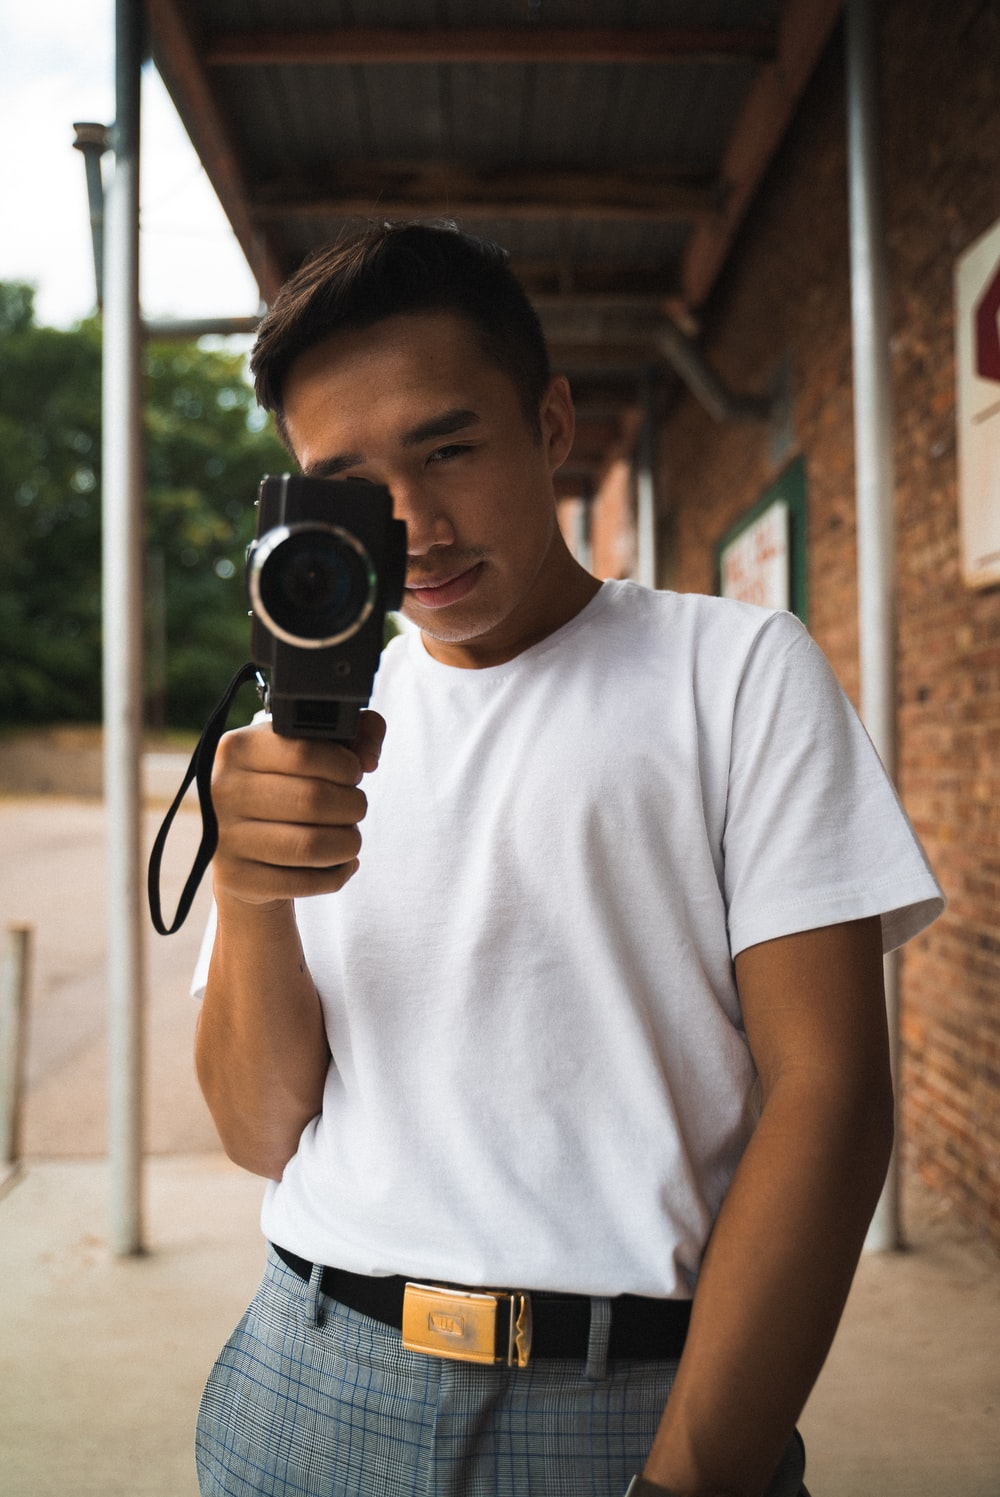 man wearing white crew-neck shirt holding video camera